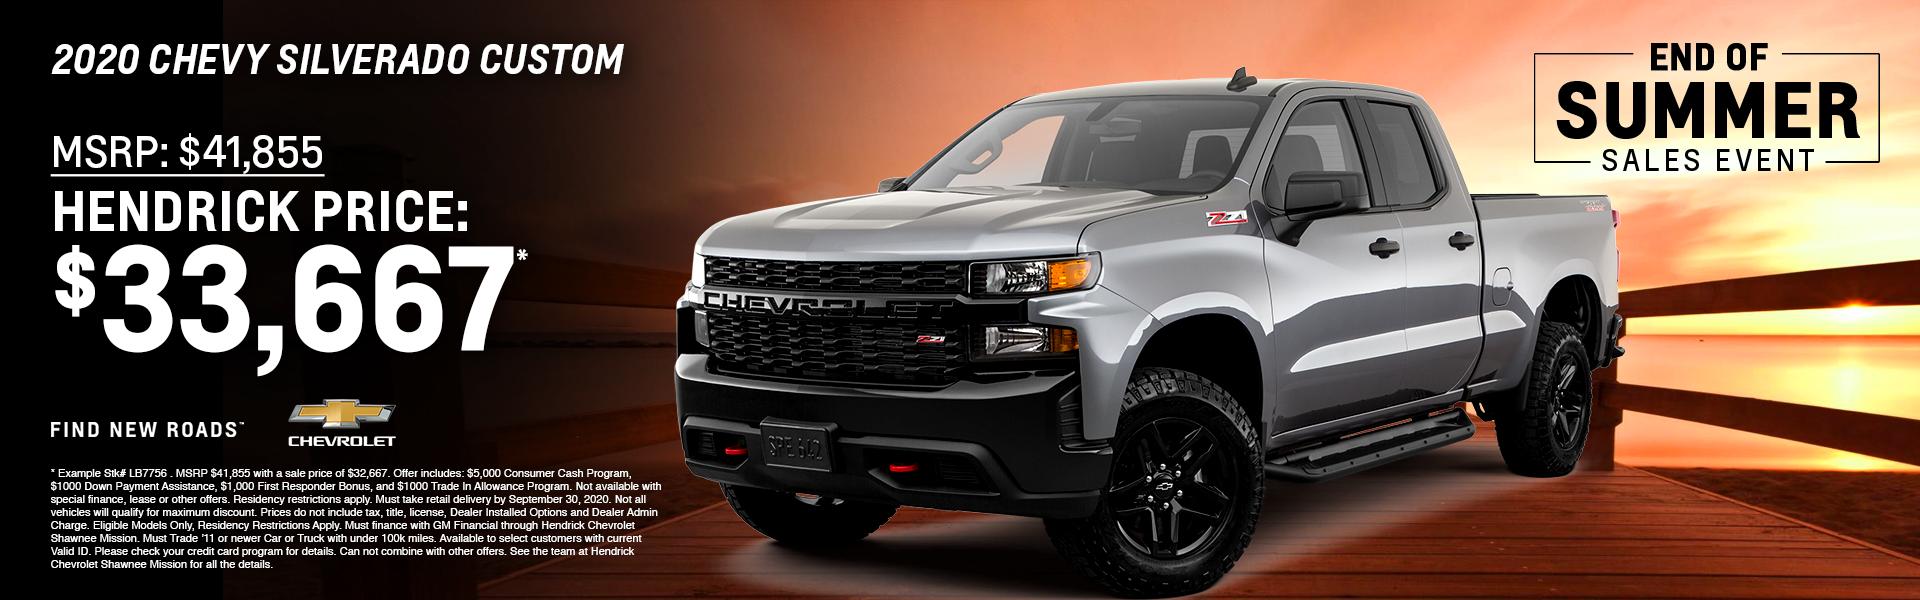 Chevy-Shawnee-Mission–Sept_TR_New-Vehicle-Specials-SILVERADO-1920×600